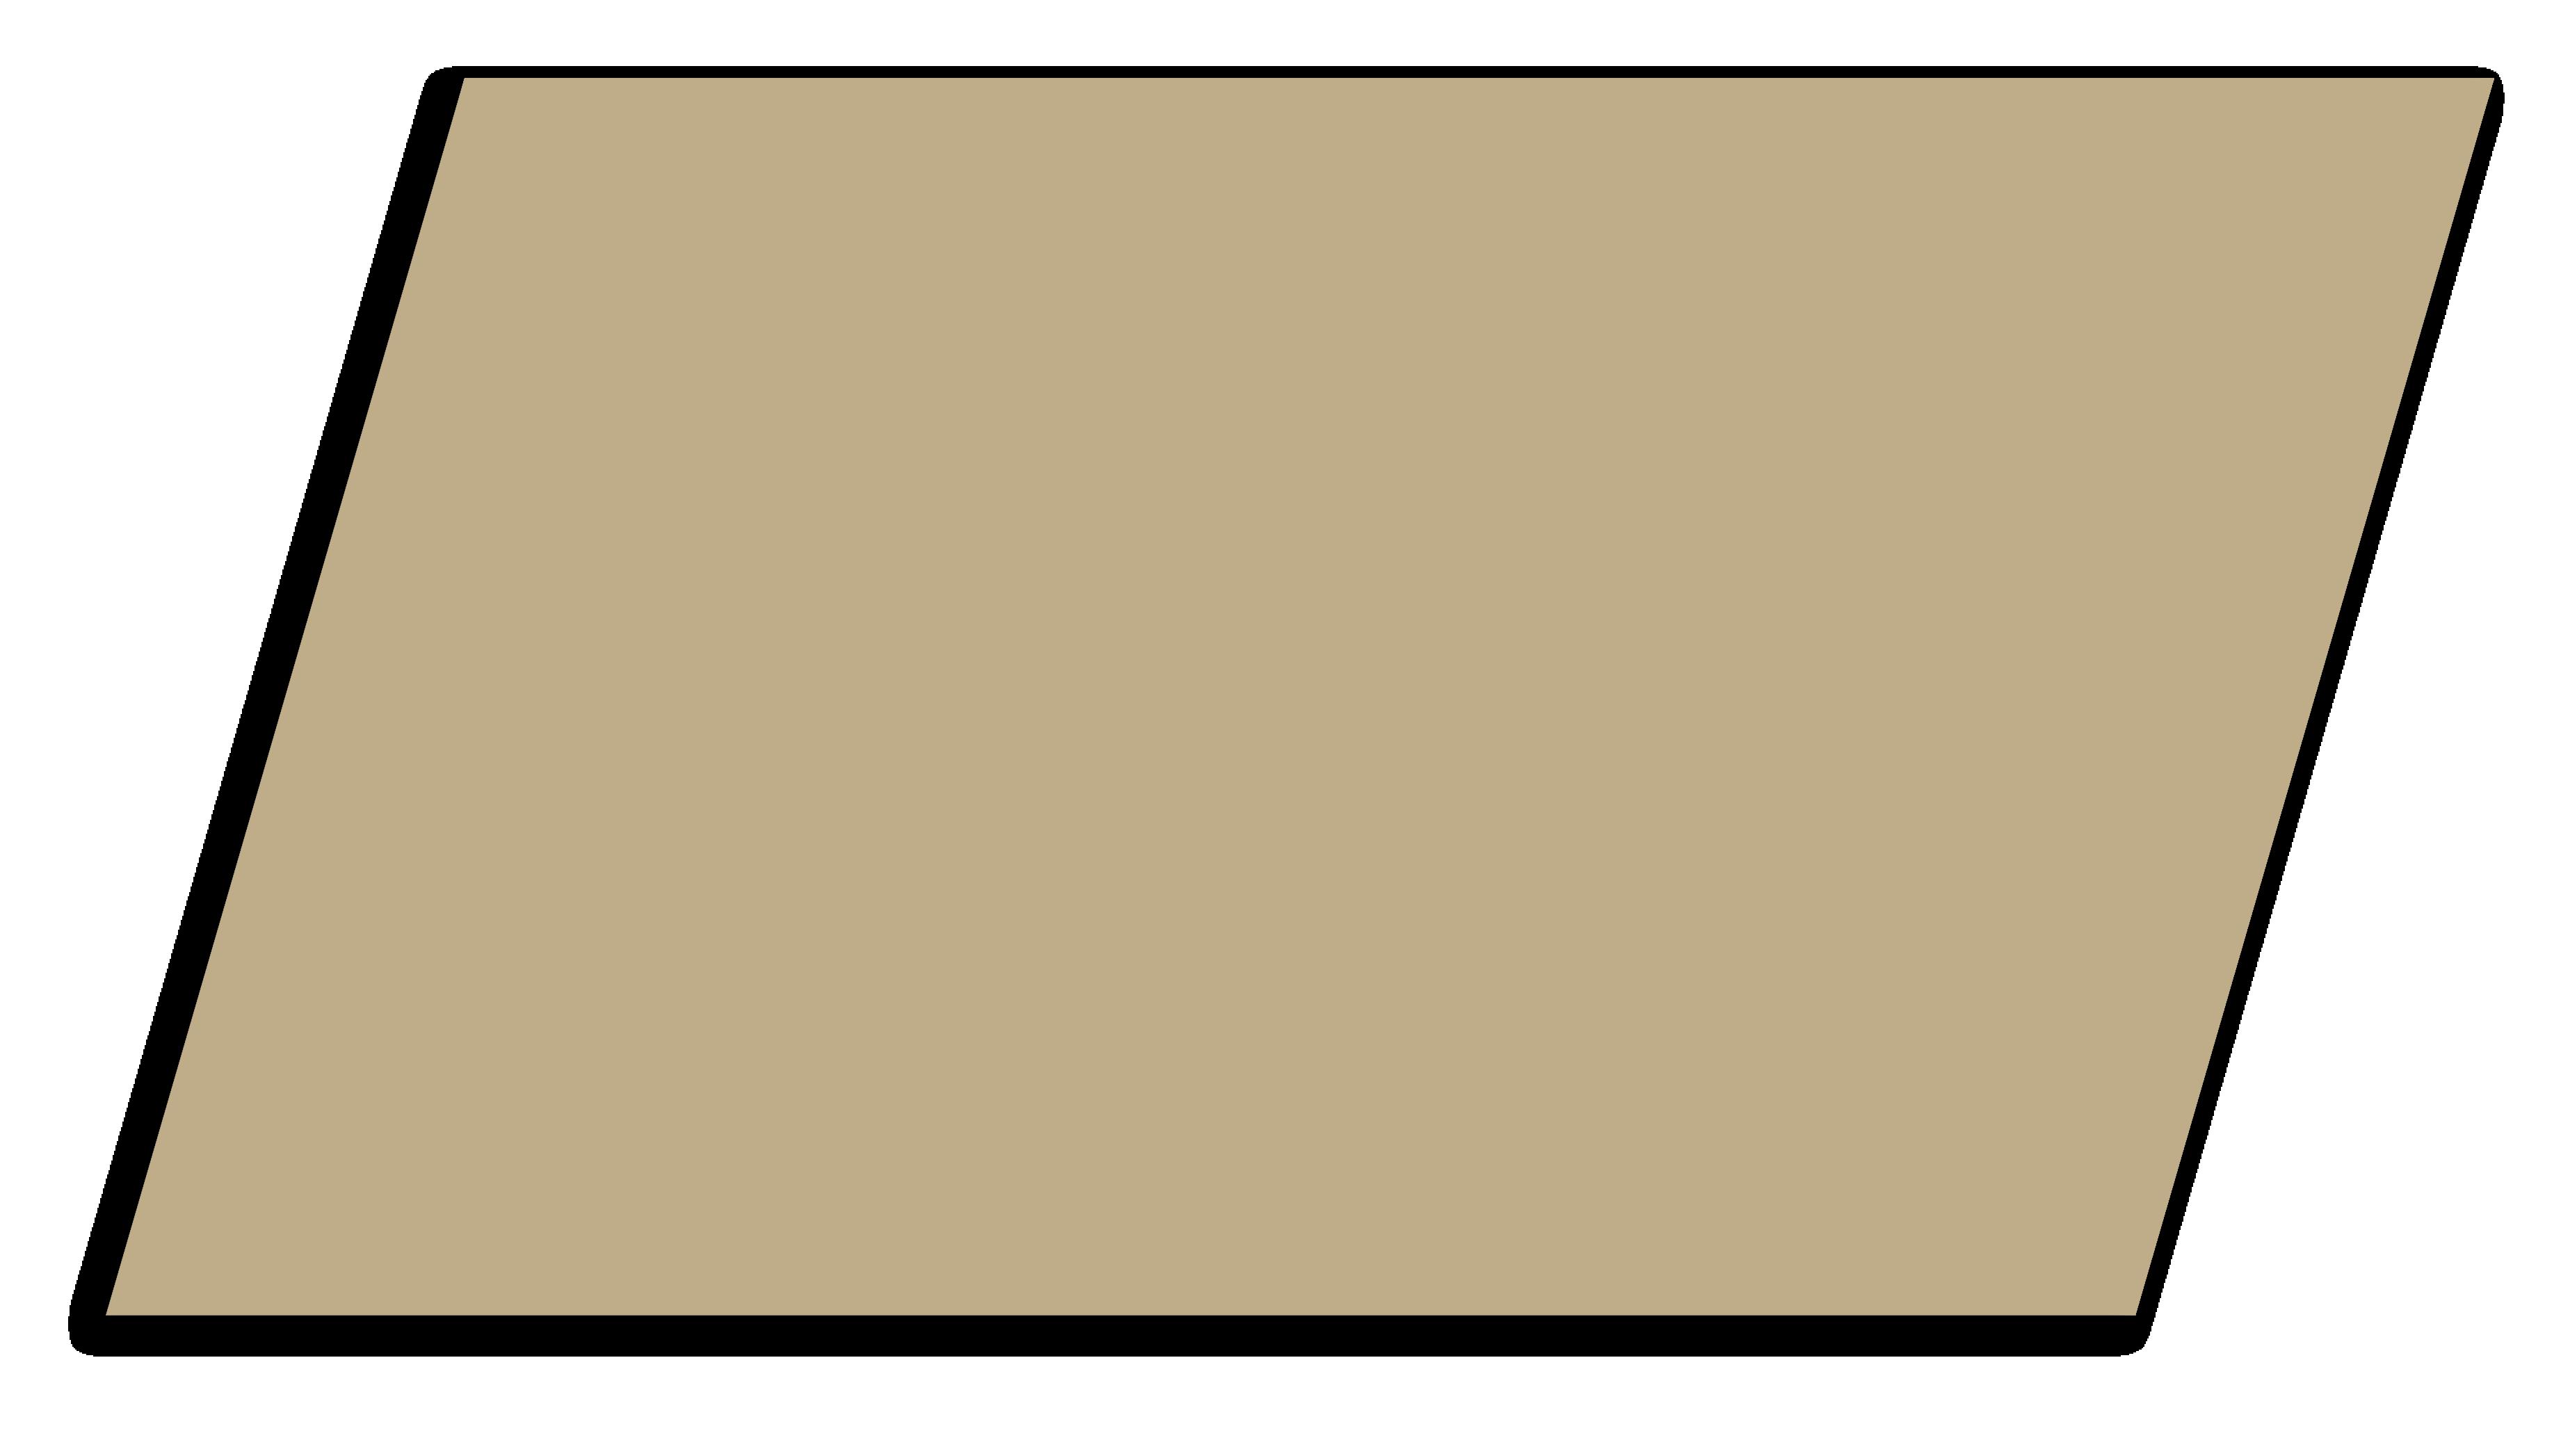 GL Tavaszindito banner polygon 1